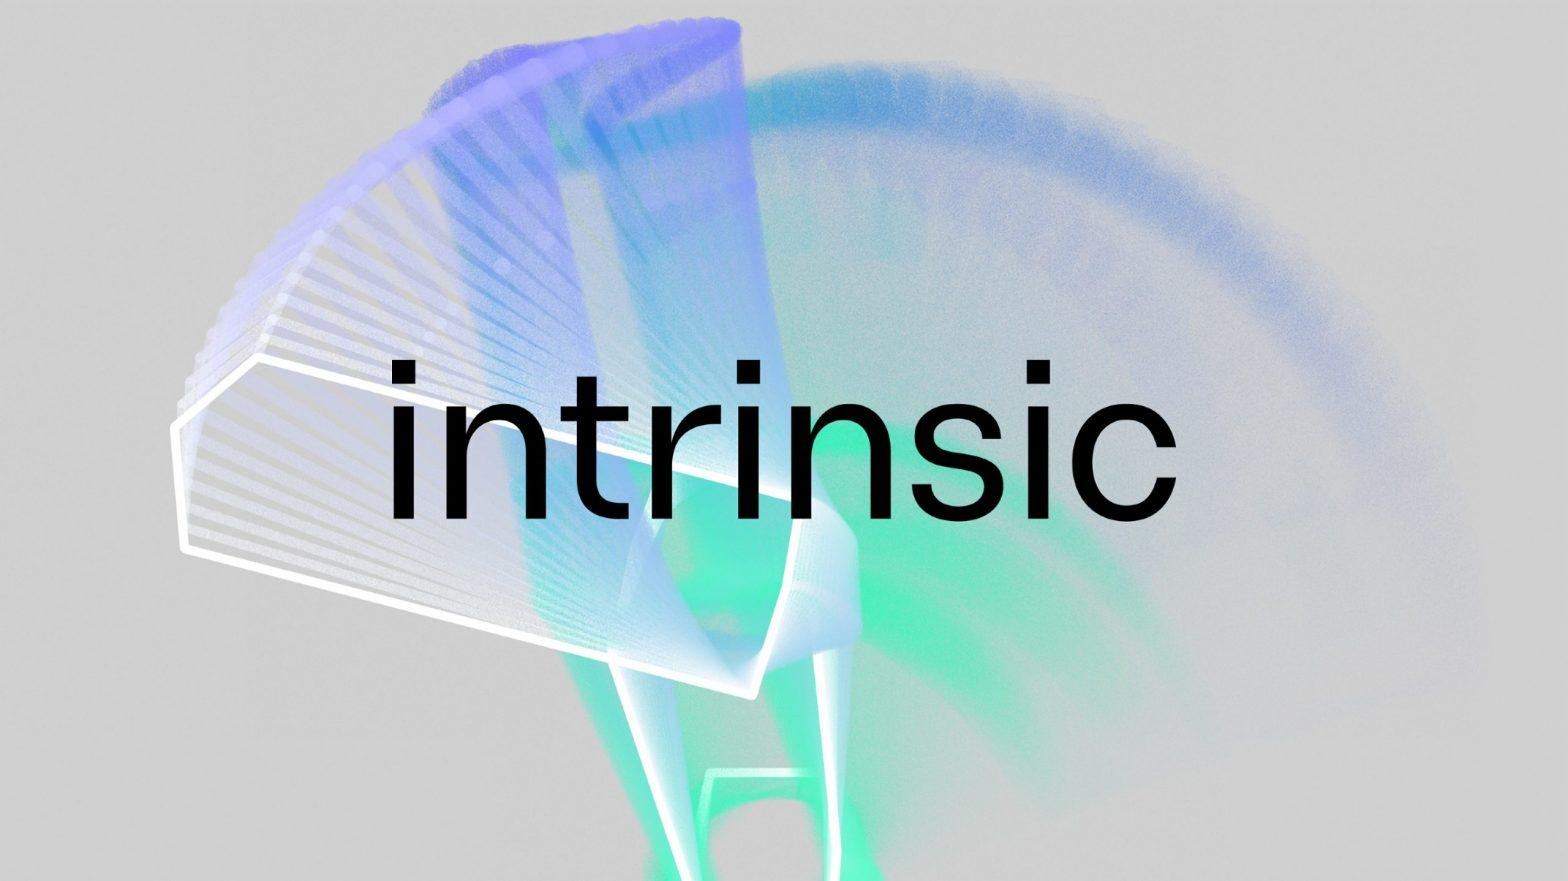 Alphabet to launch a new Robotics Company called Intrinsic_40.1